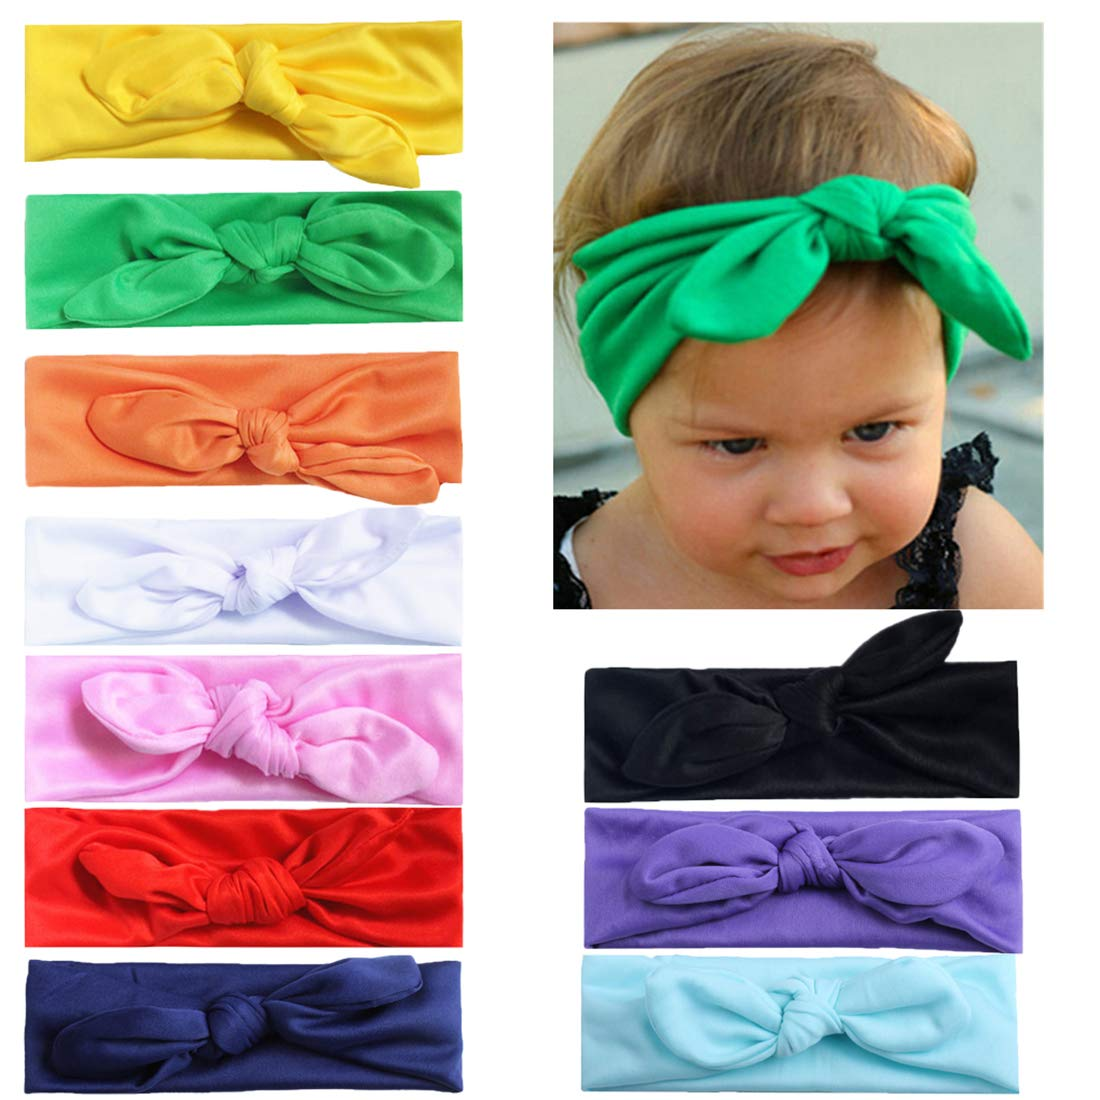 Xinshiベビー帽子女の子ソフトターバン幼児用ウサギ耳セットヘッドキャップ B07FL7QC9W Re3(10pcs) Re3(10pcs)